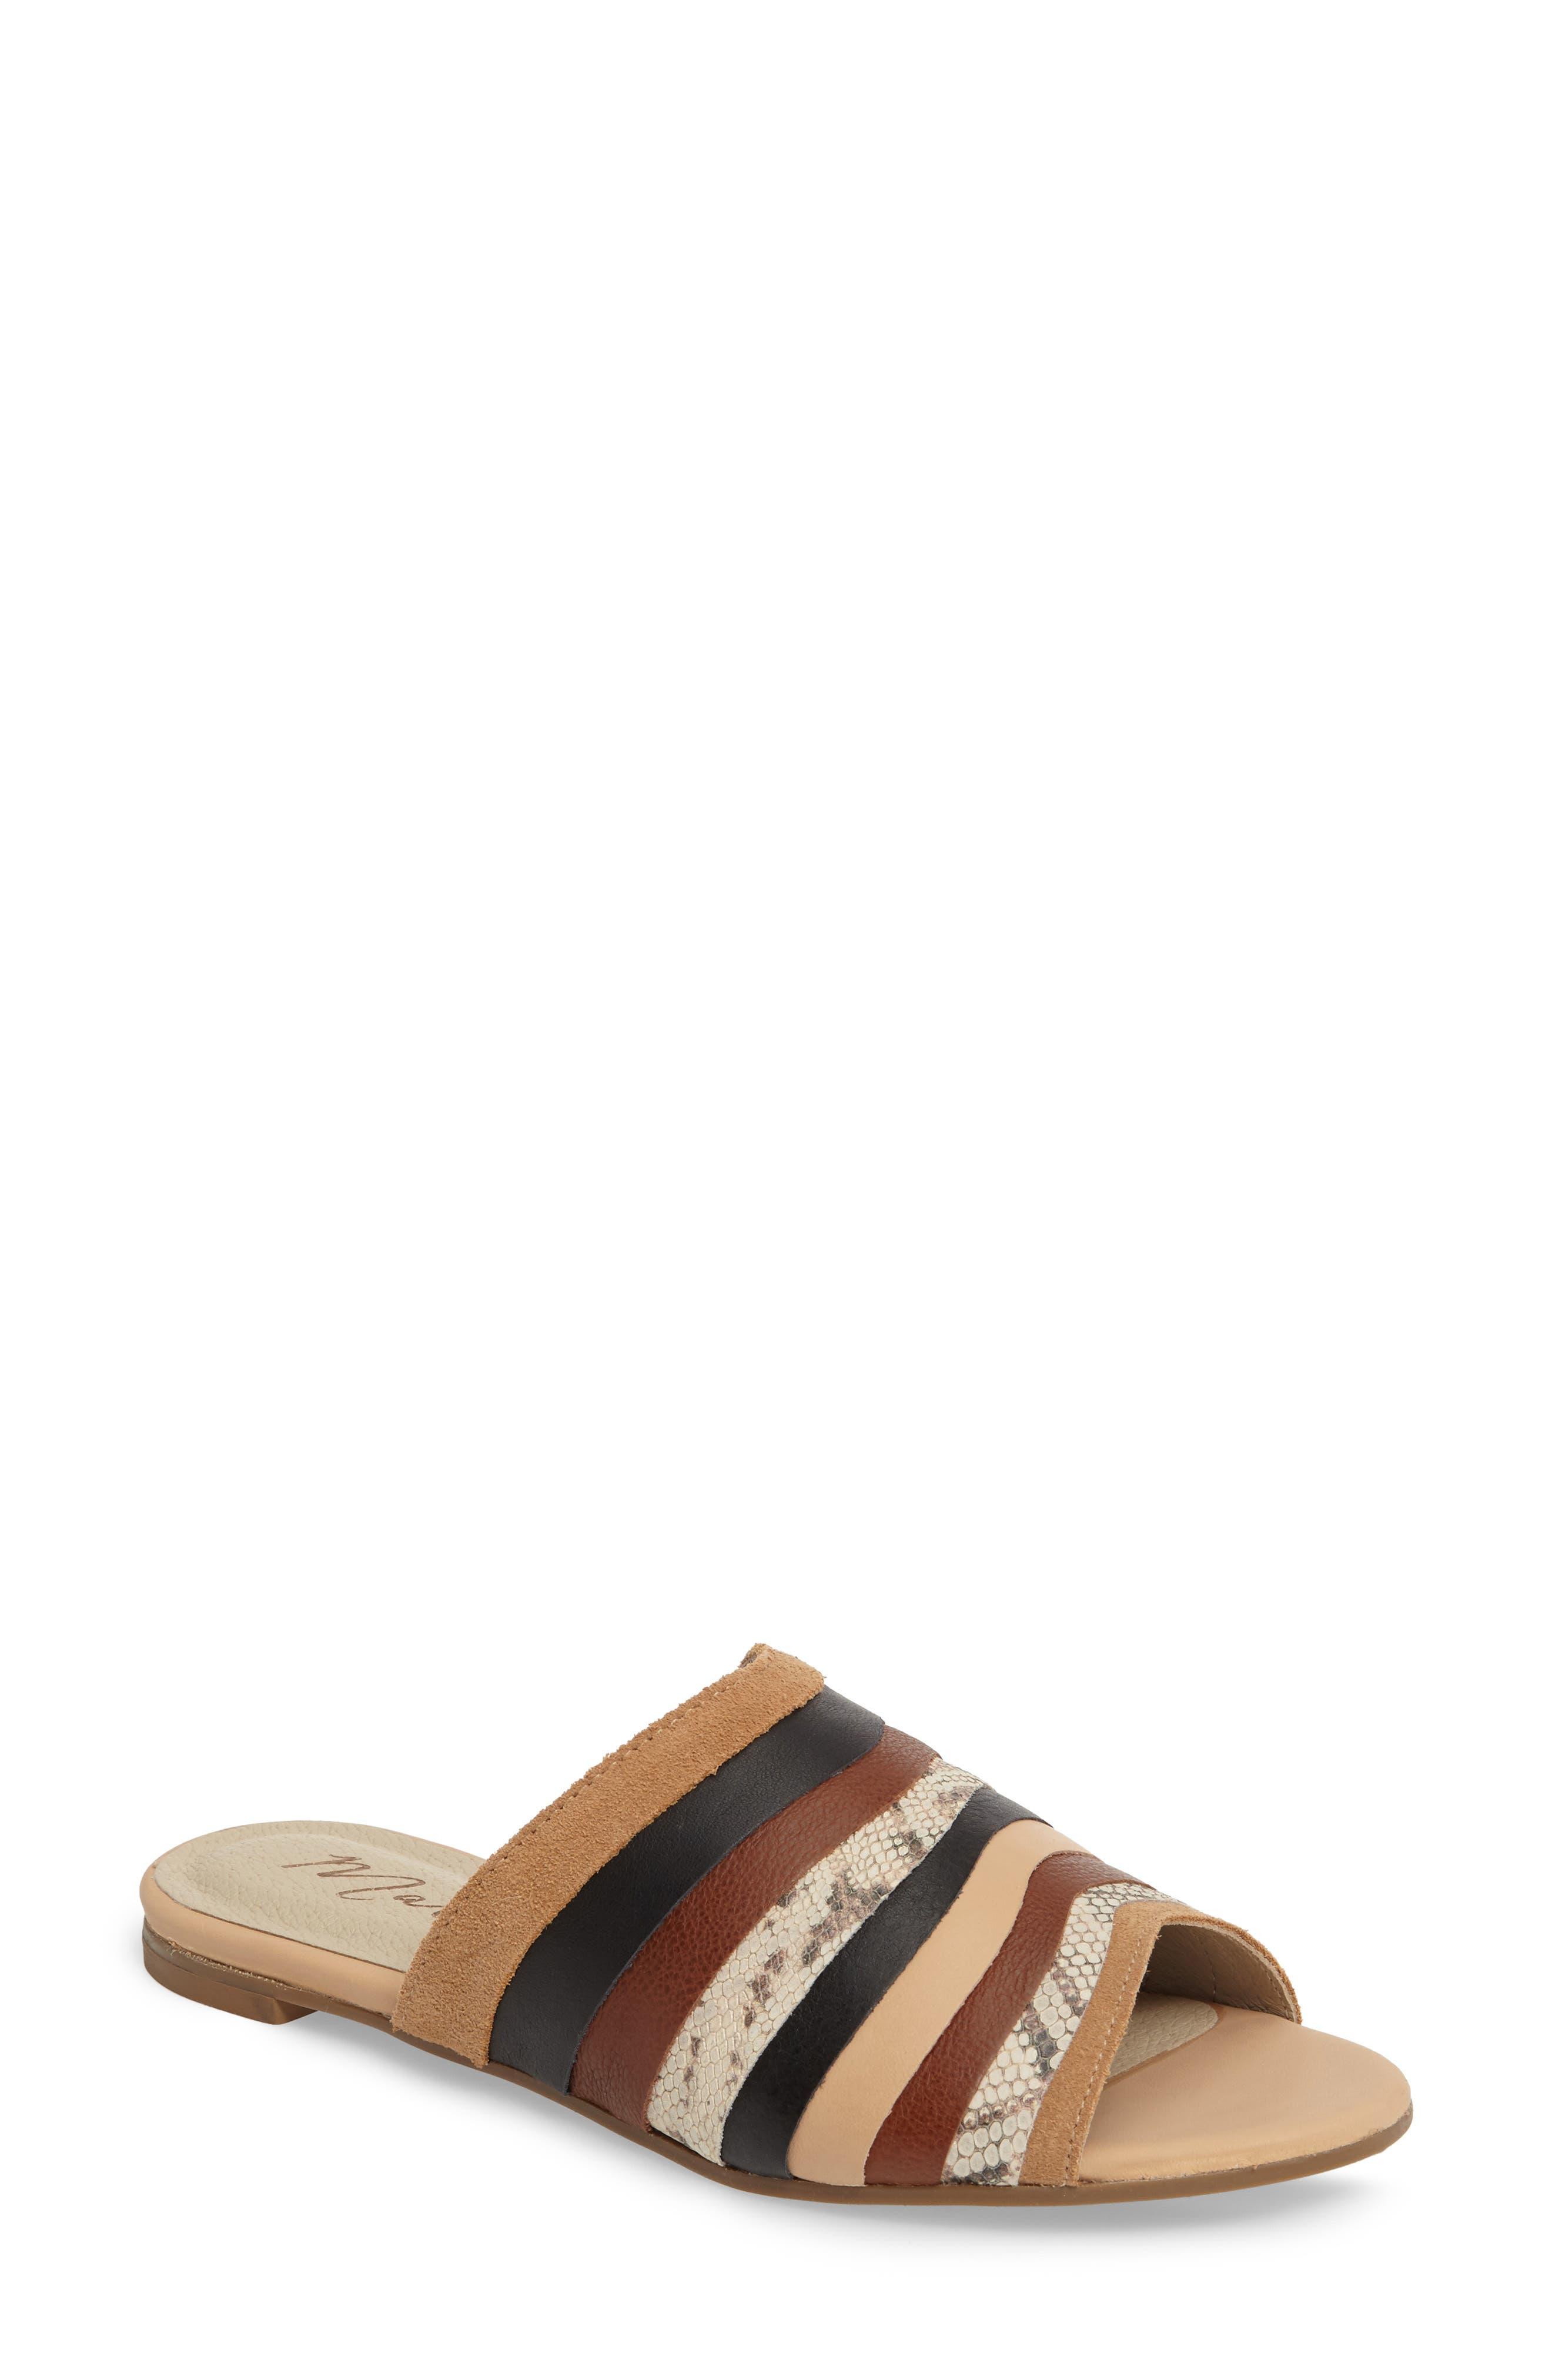 Moody Slide Sandal,                         Main,                         color, 250